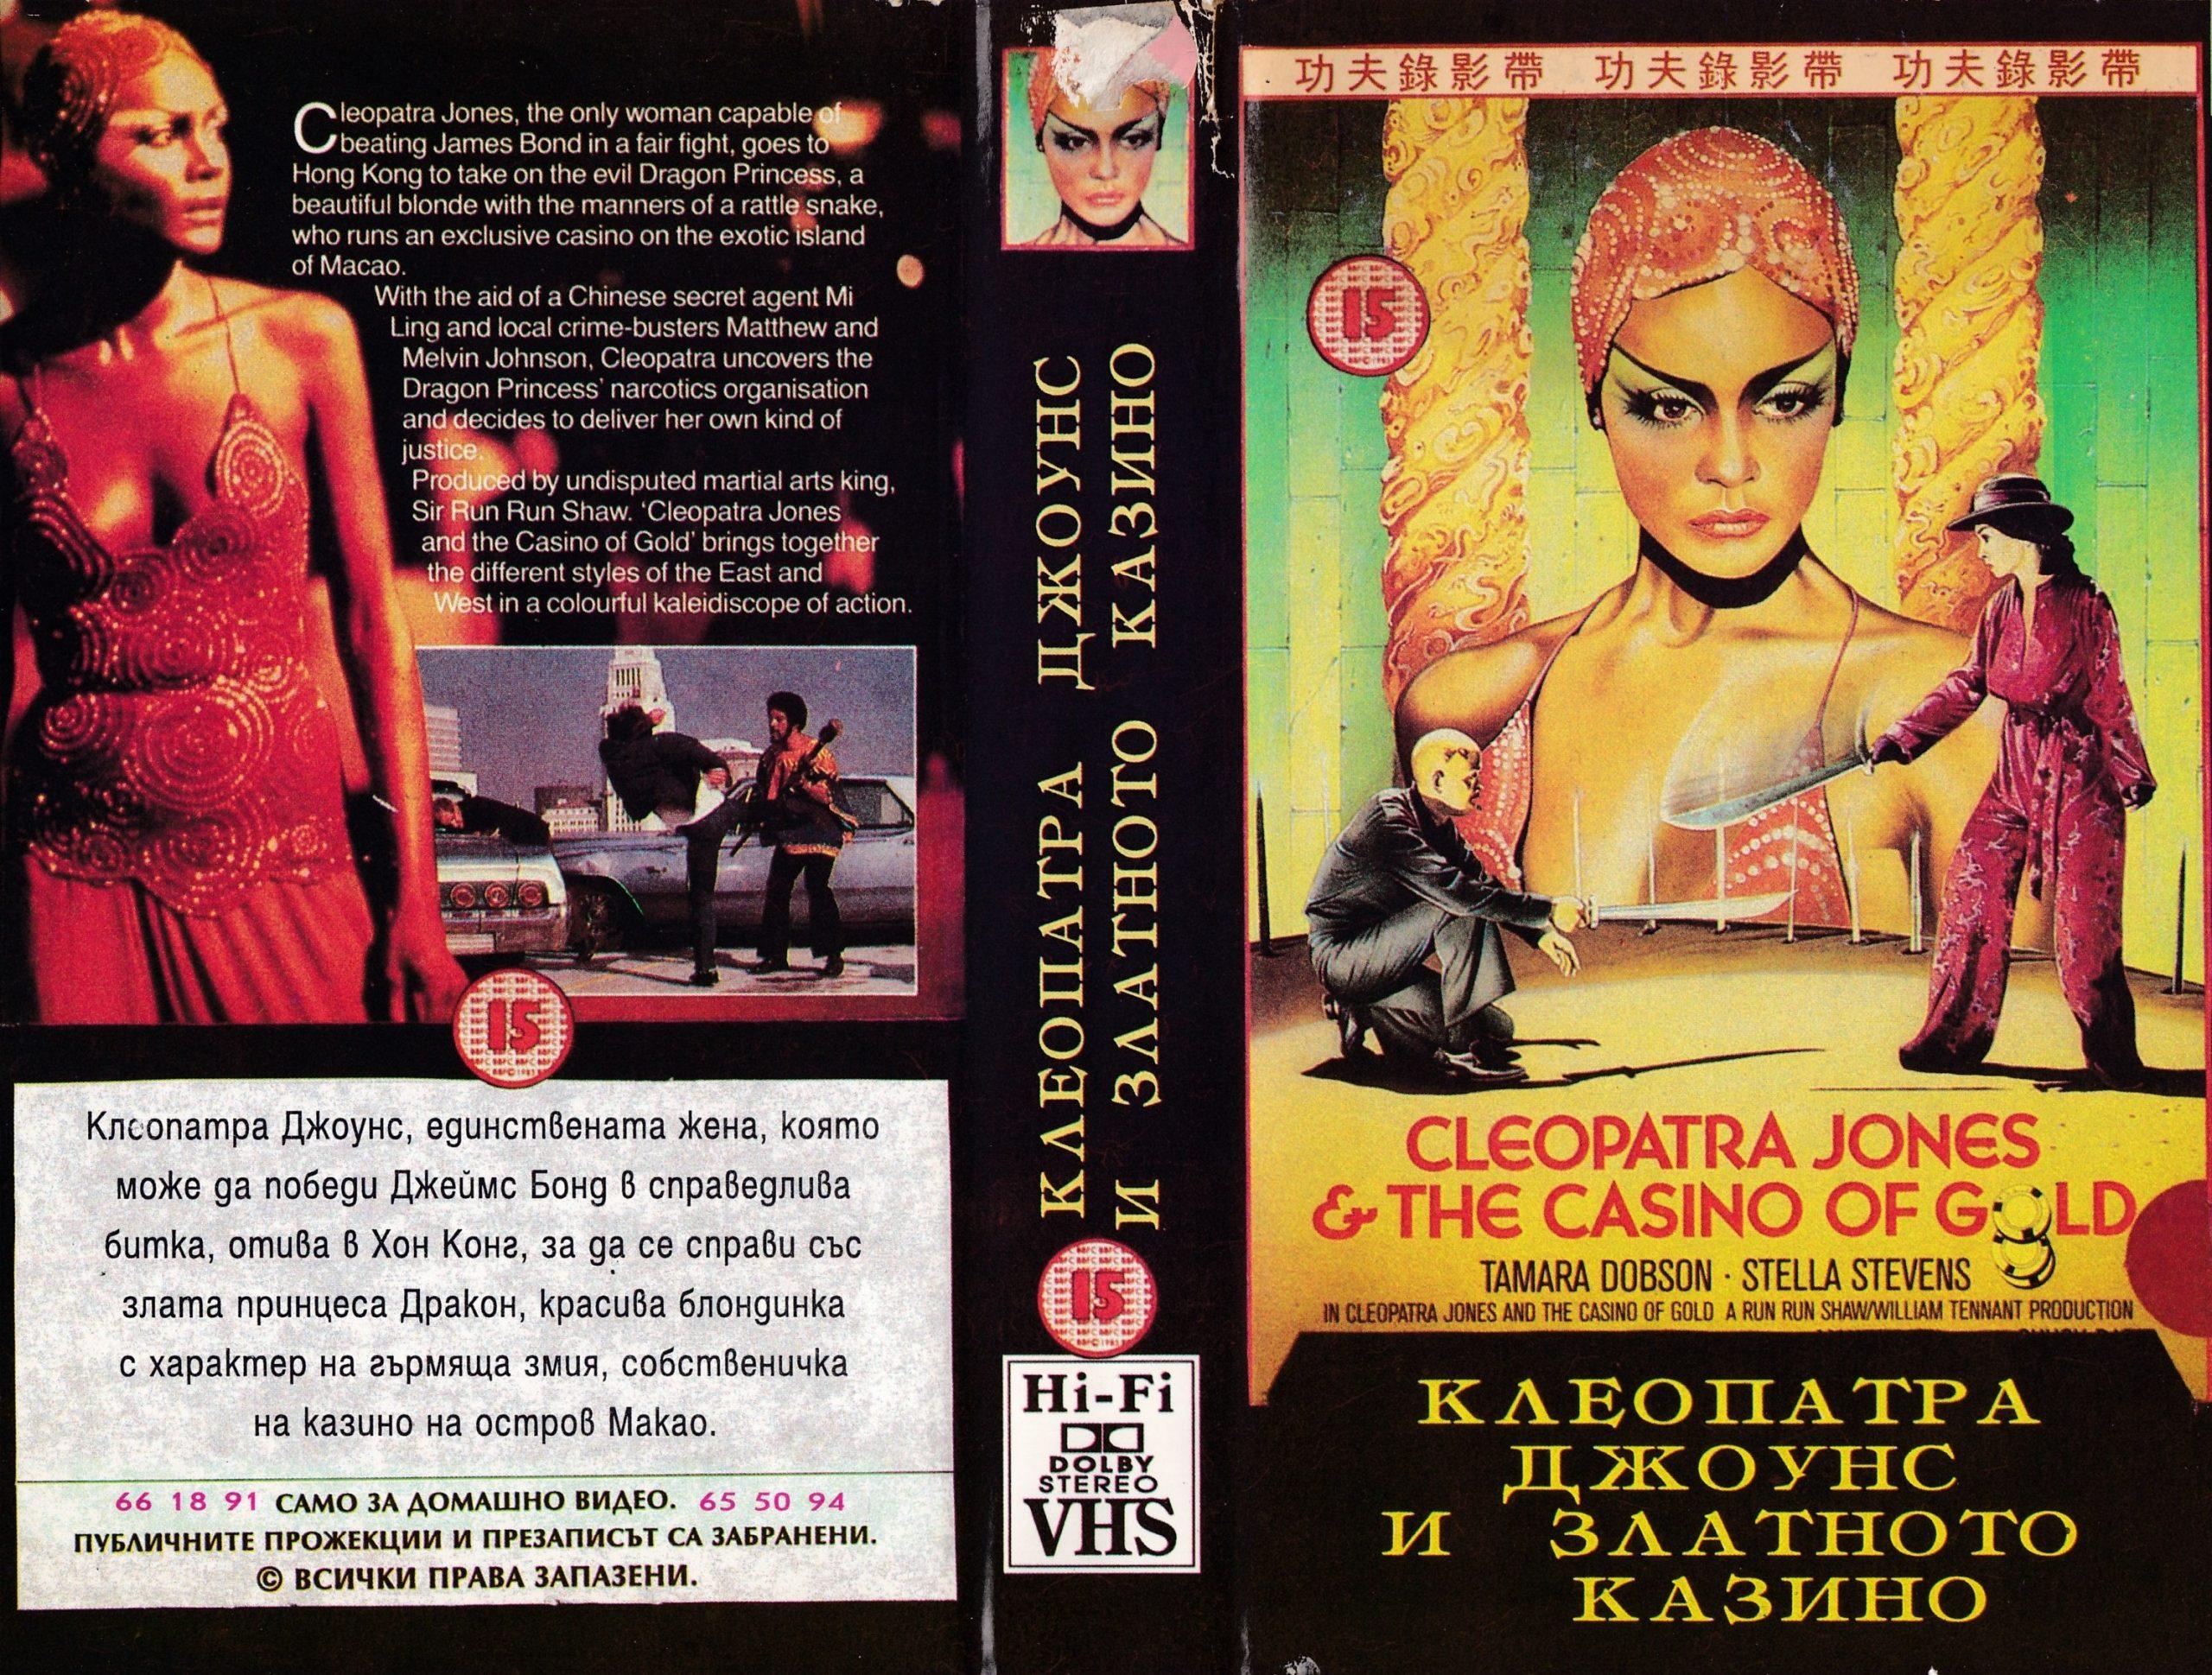 Клеопатра Джоунс и златното казино